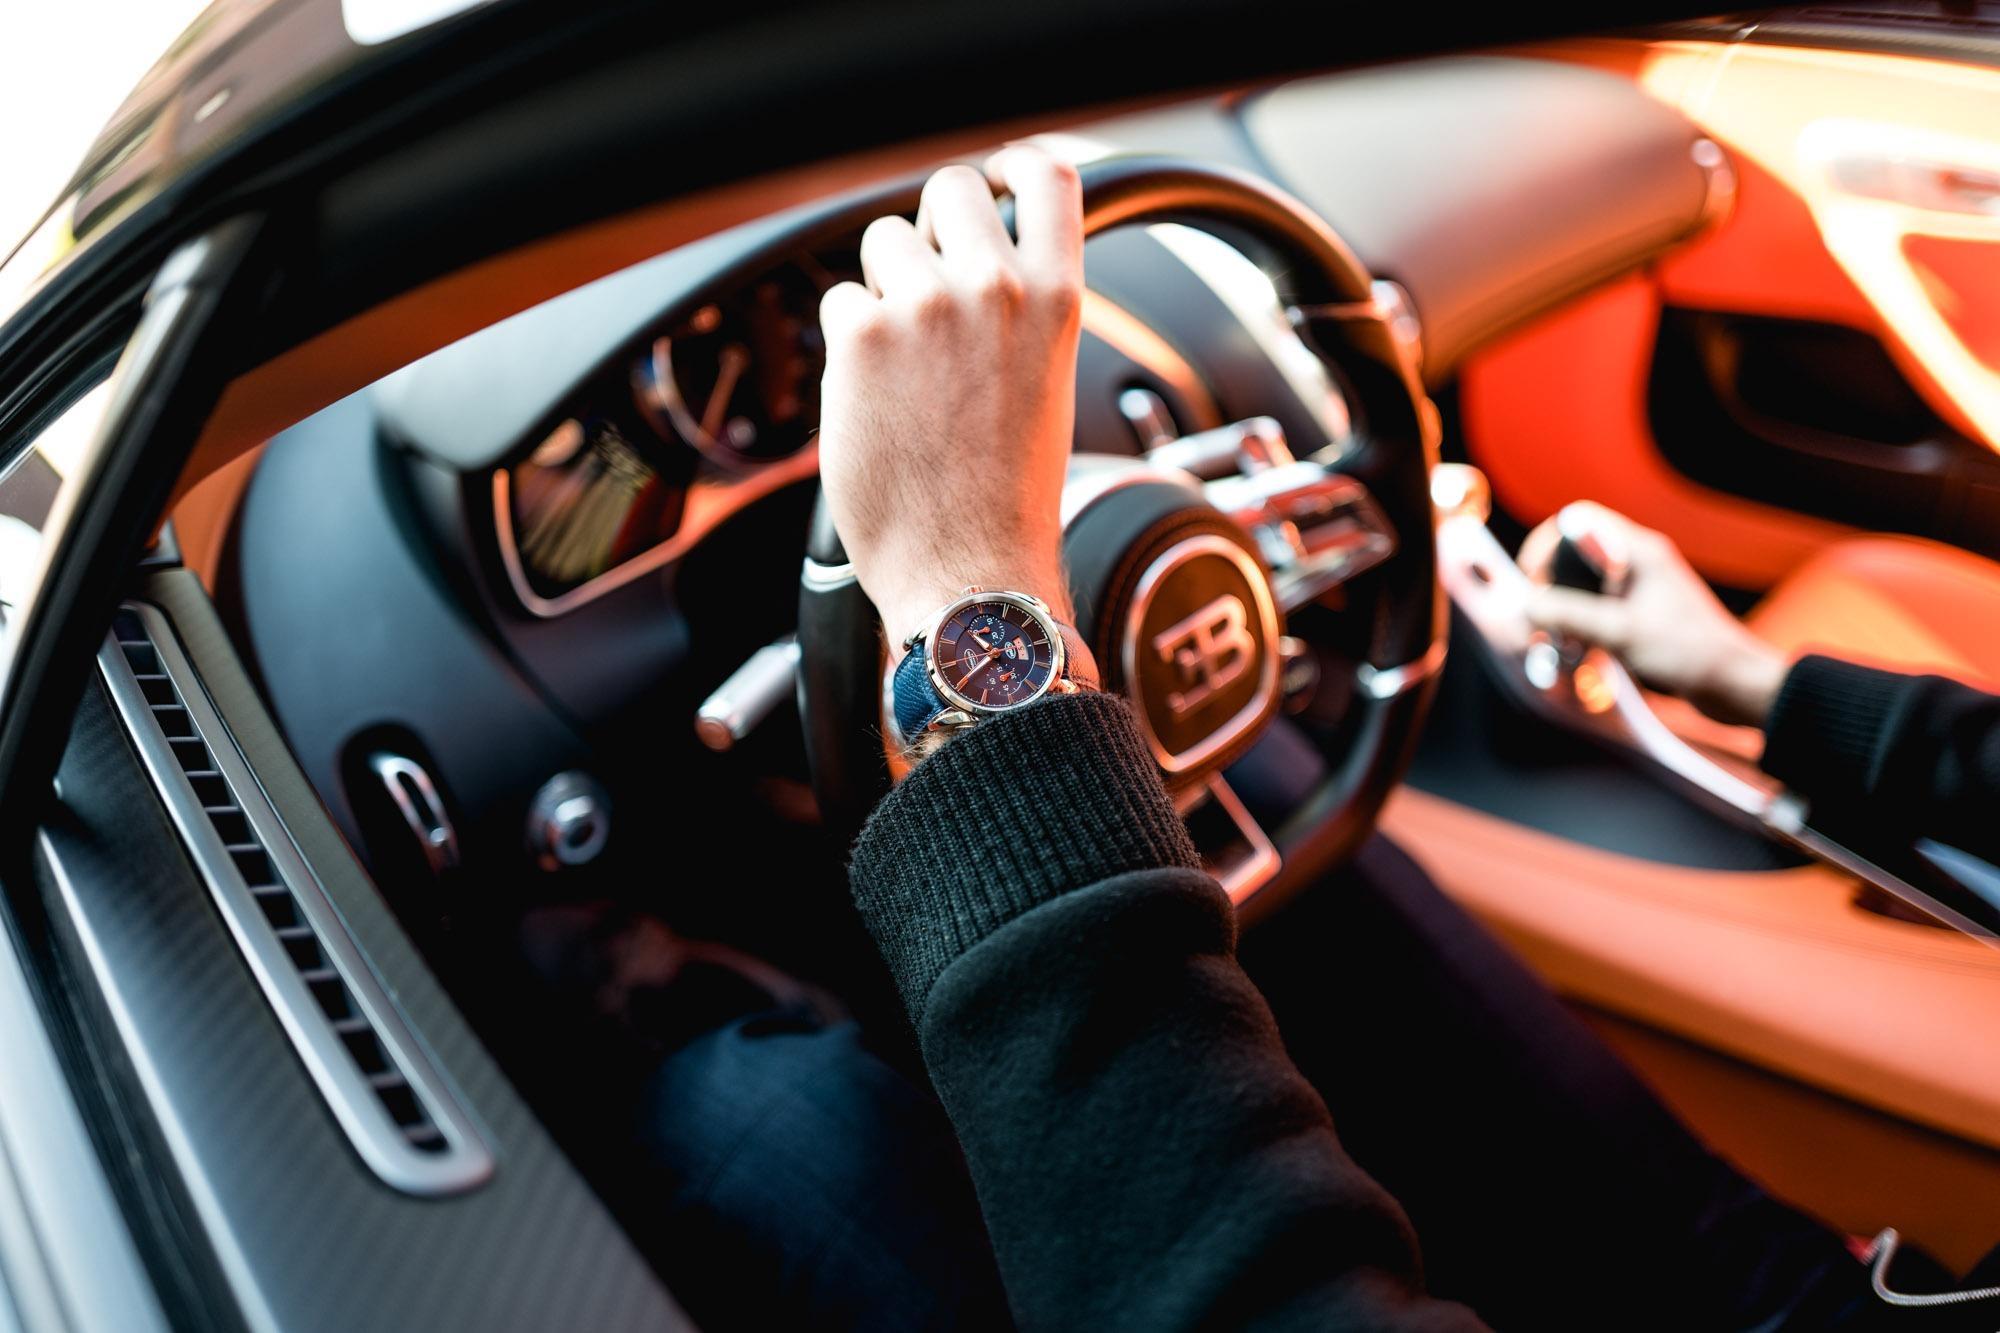 Ateliers Bugatti à Molsheim - Bugatti Chiron -Parmigiani Aerolithe Chronograph